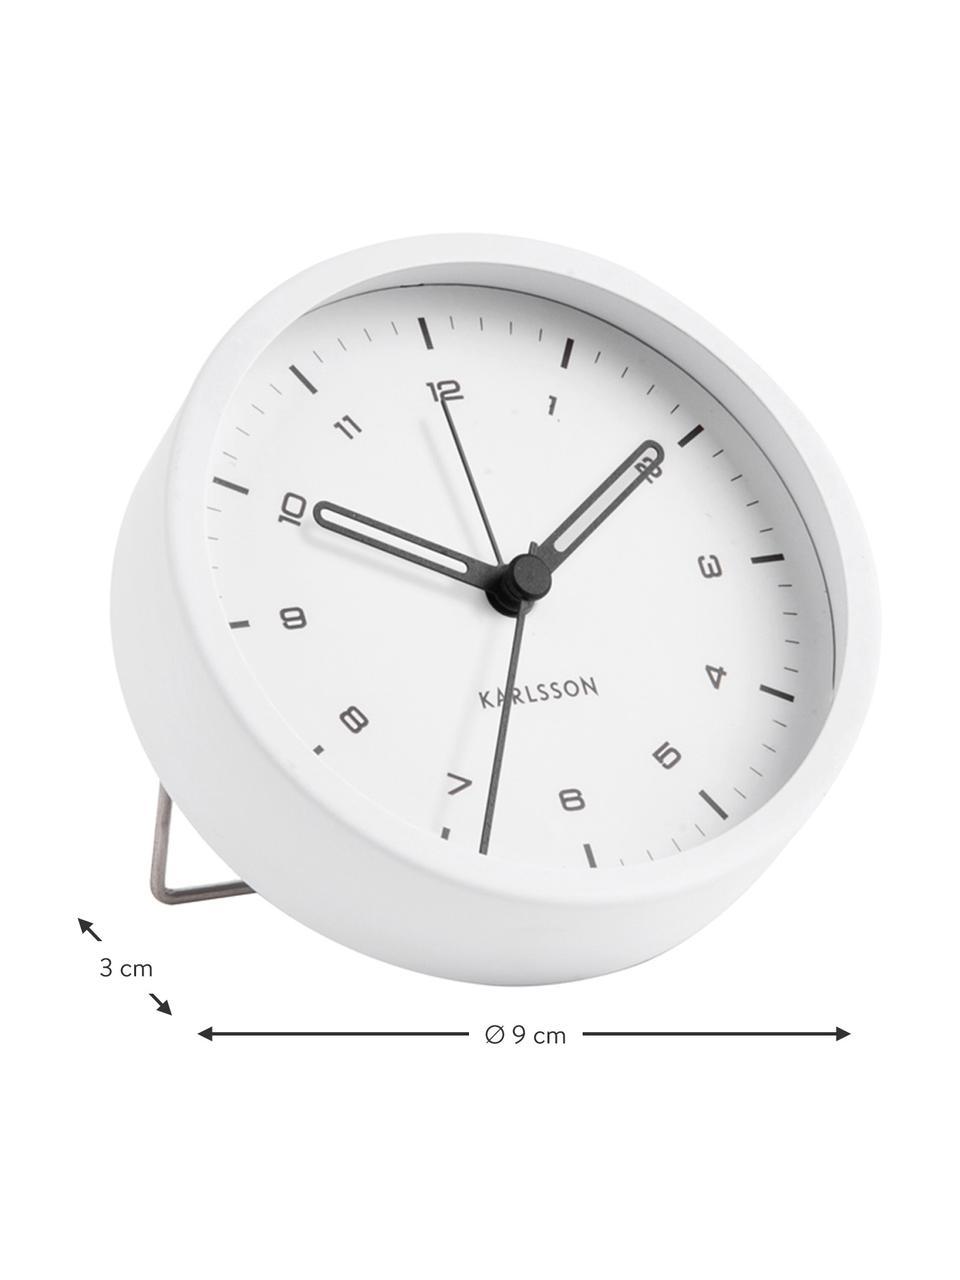 Sveglia Tinge, Acciaio, verniciato, Bianco, Ø 9 x P 3 cm